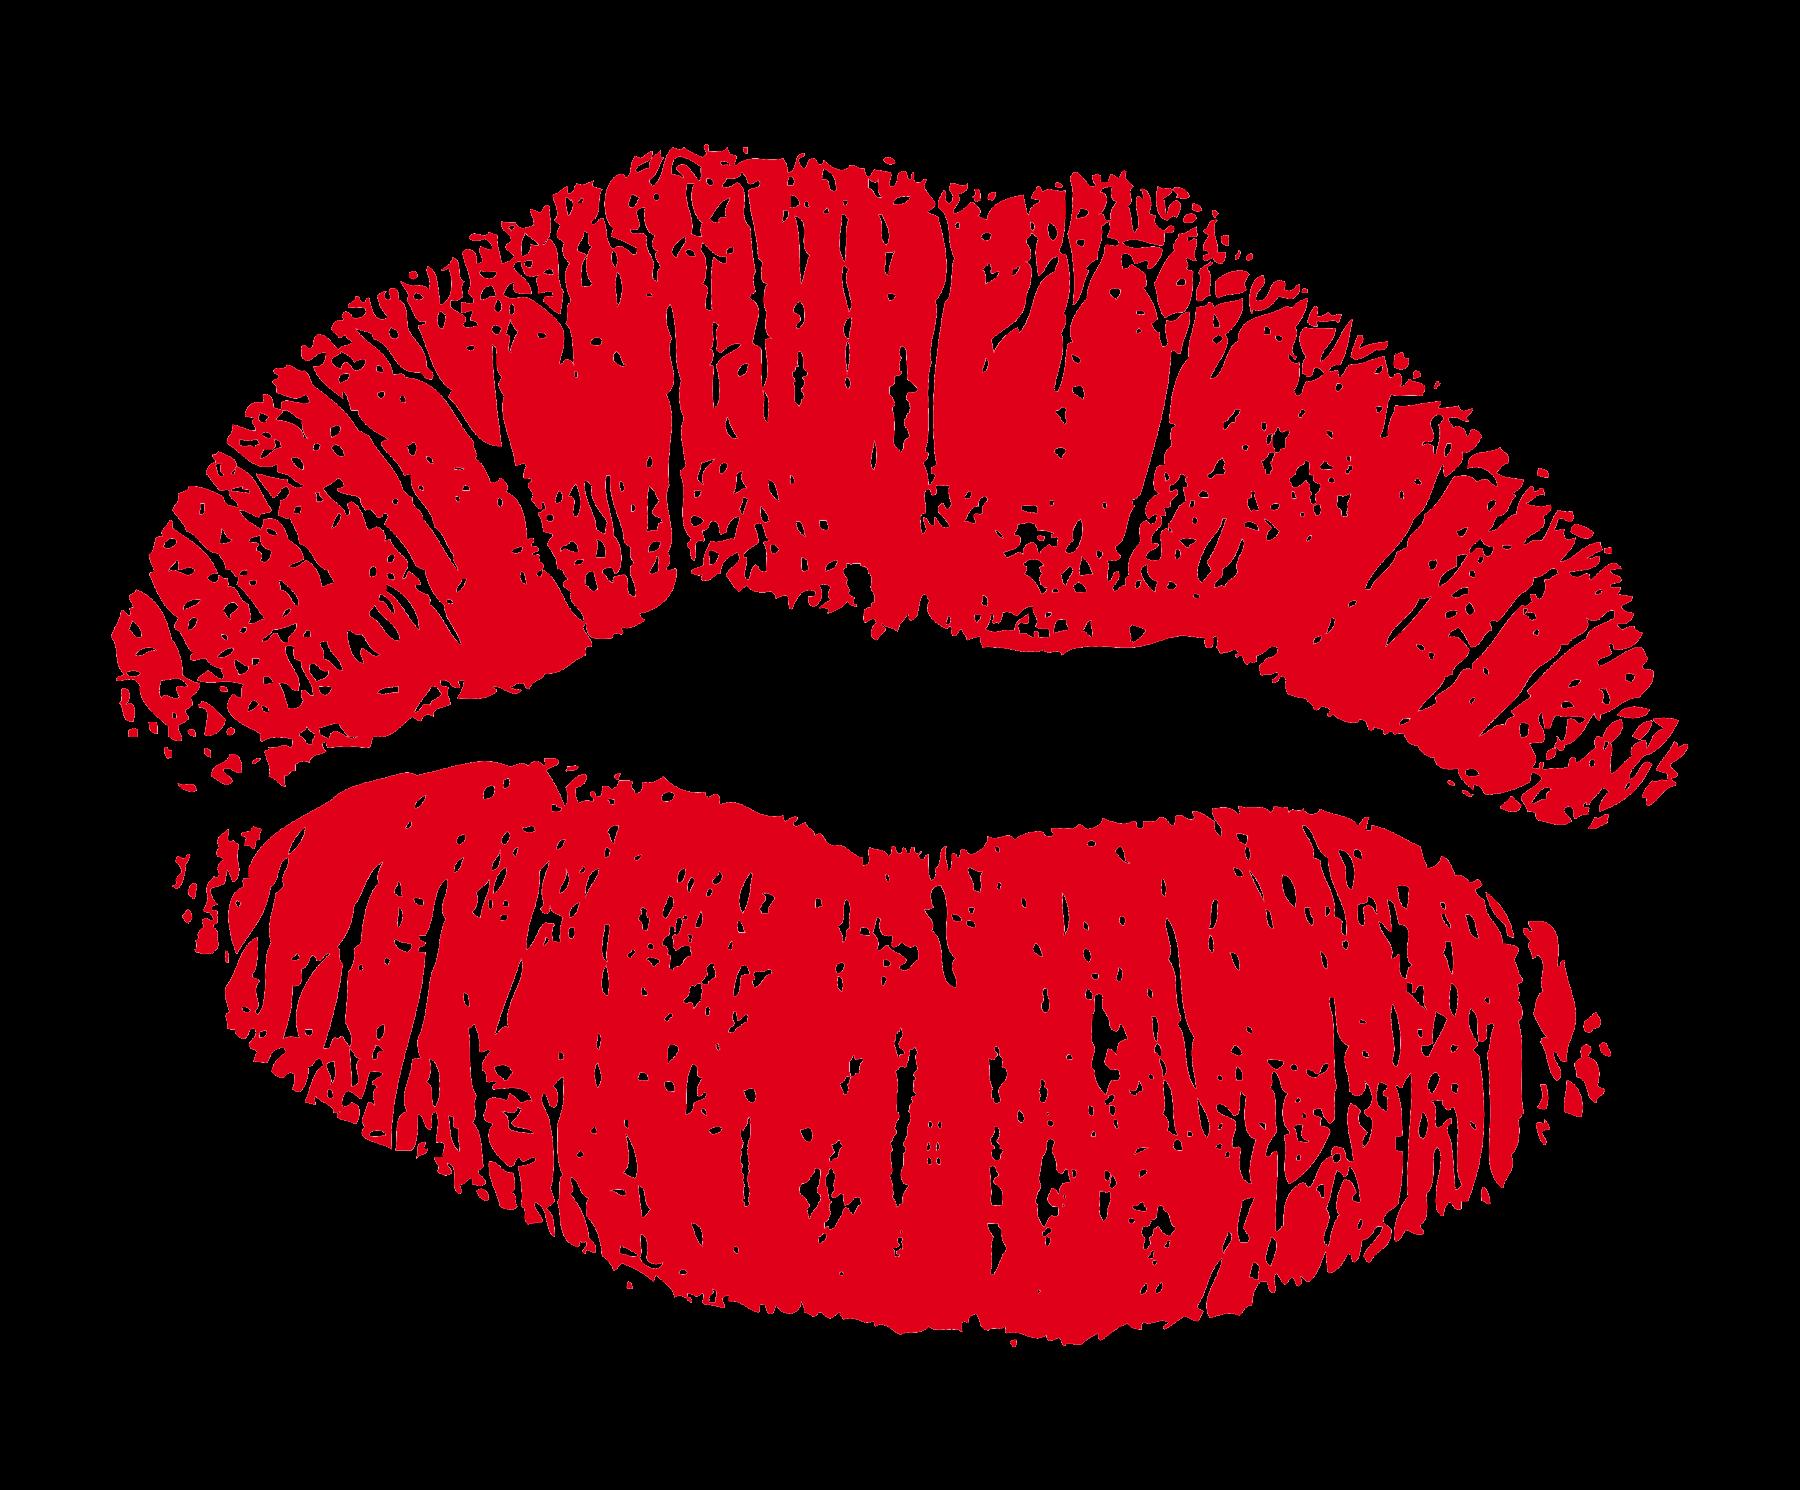 /var/www/html/wp-content/uploads/2018/10/Kiss_PNG_Image_40683-2